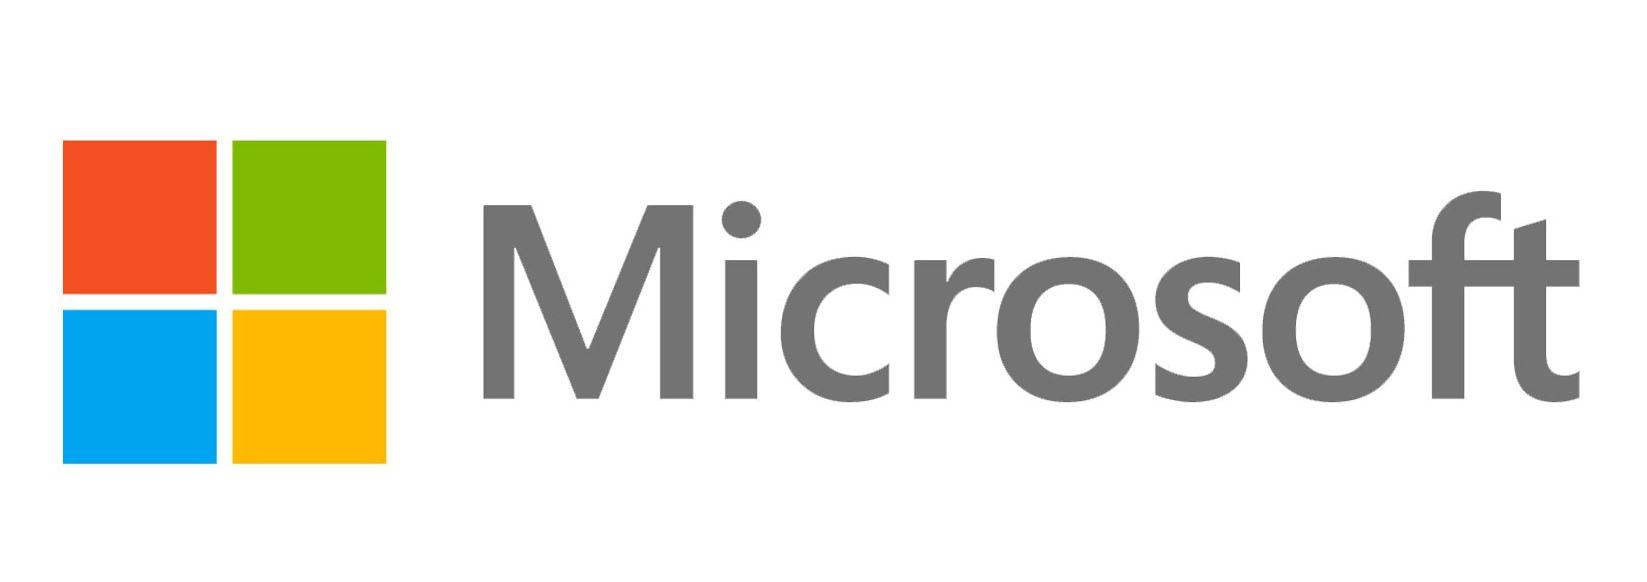 Microsoft_partners_logo